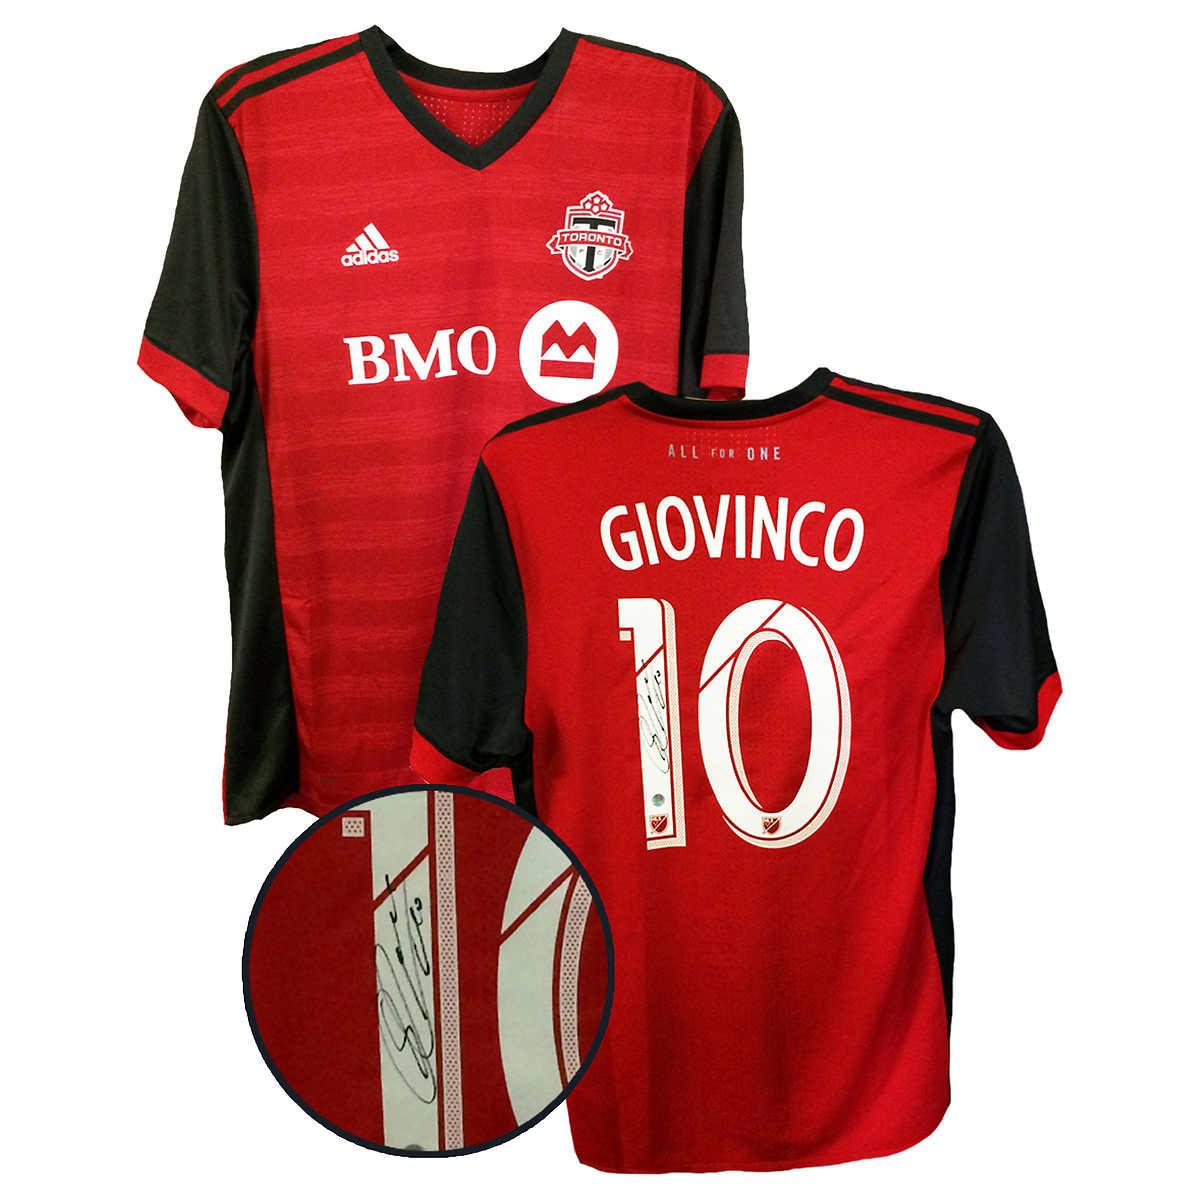 8bc3cf2a0 Sebastian Giovinco Signed Toronto FC Jersey. 1 1